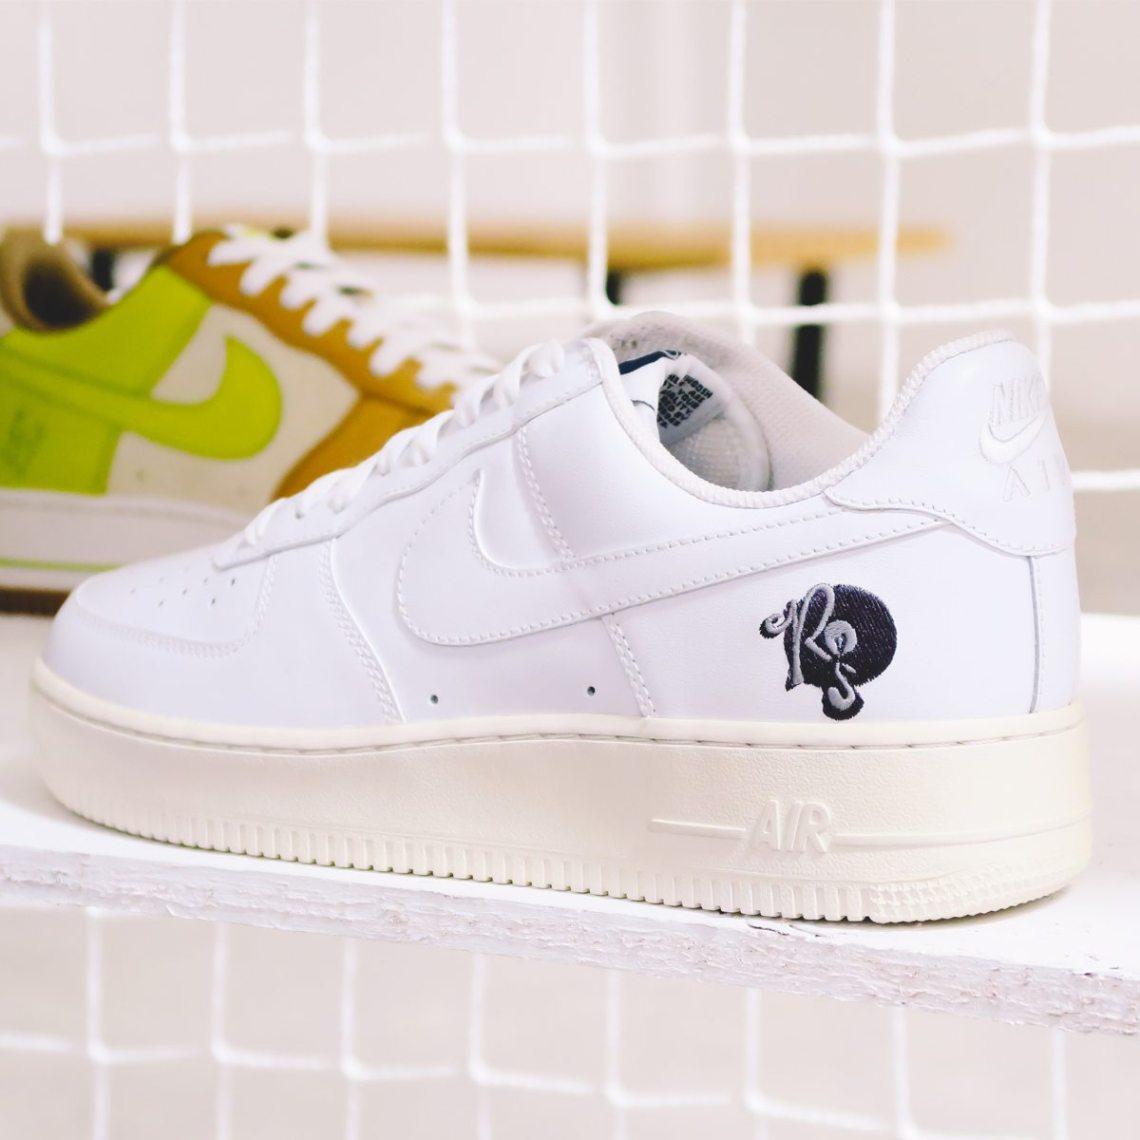 Roc-A-Fella x Nike Air Force 1 Set to Retro in 2017